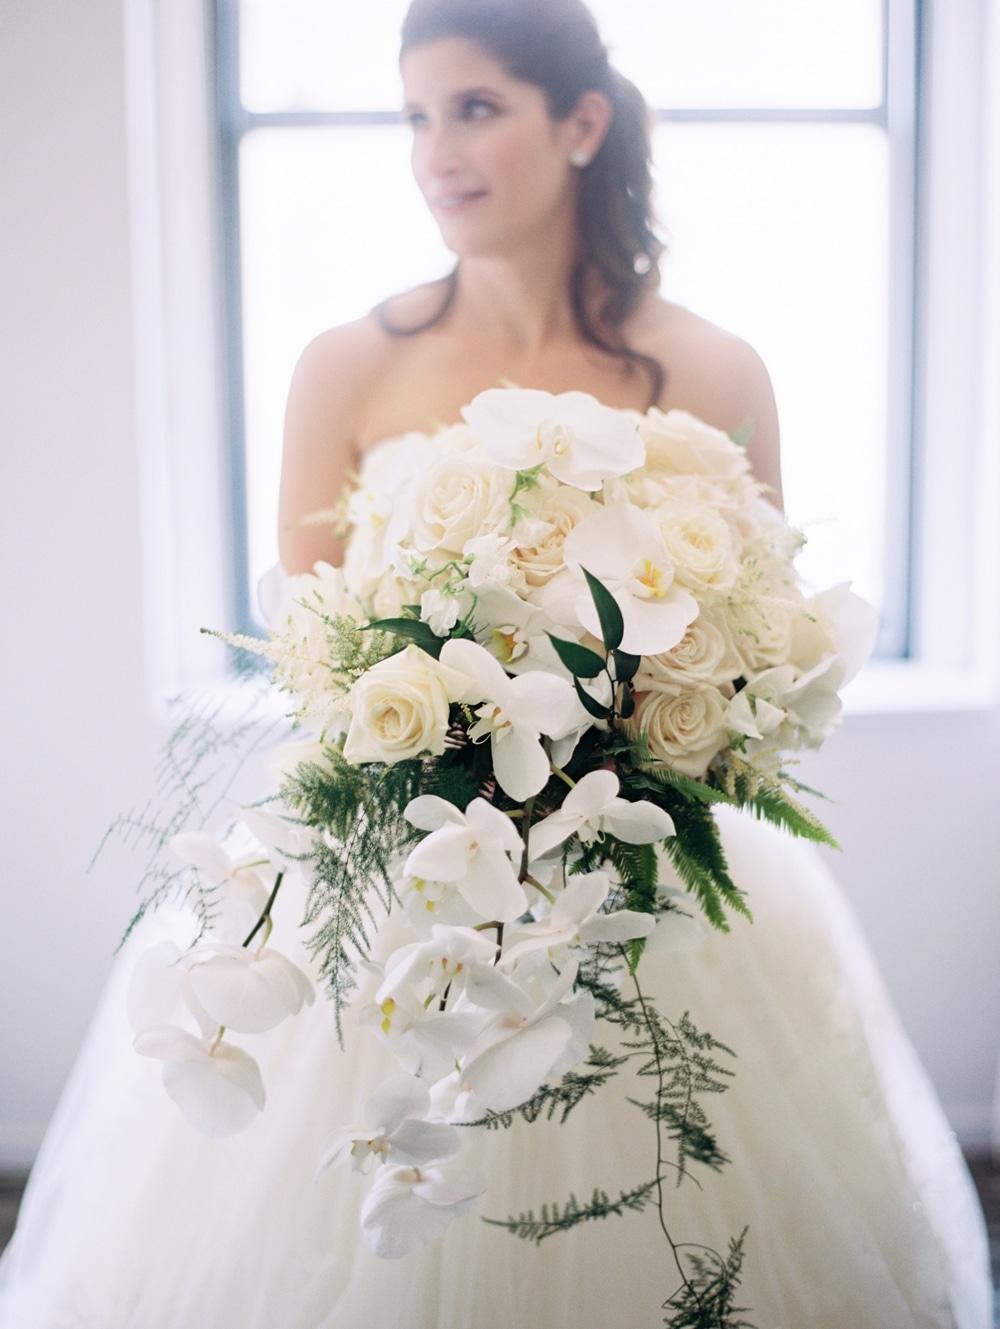 kristin-la-voie-photography-Cincinnati-Music-Hall-Wedding-45